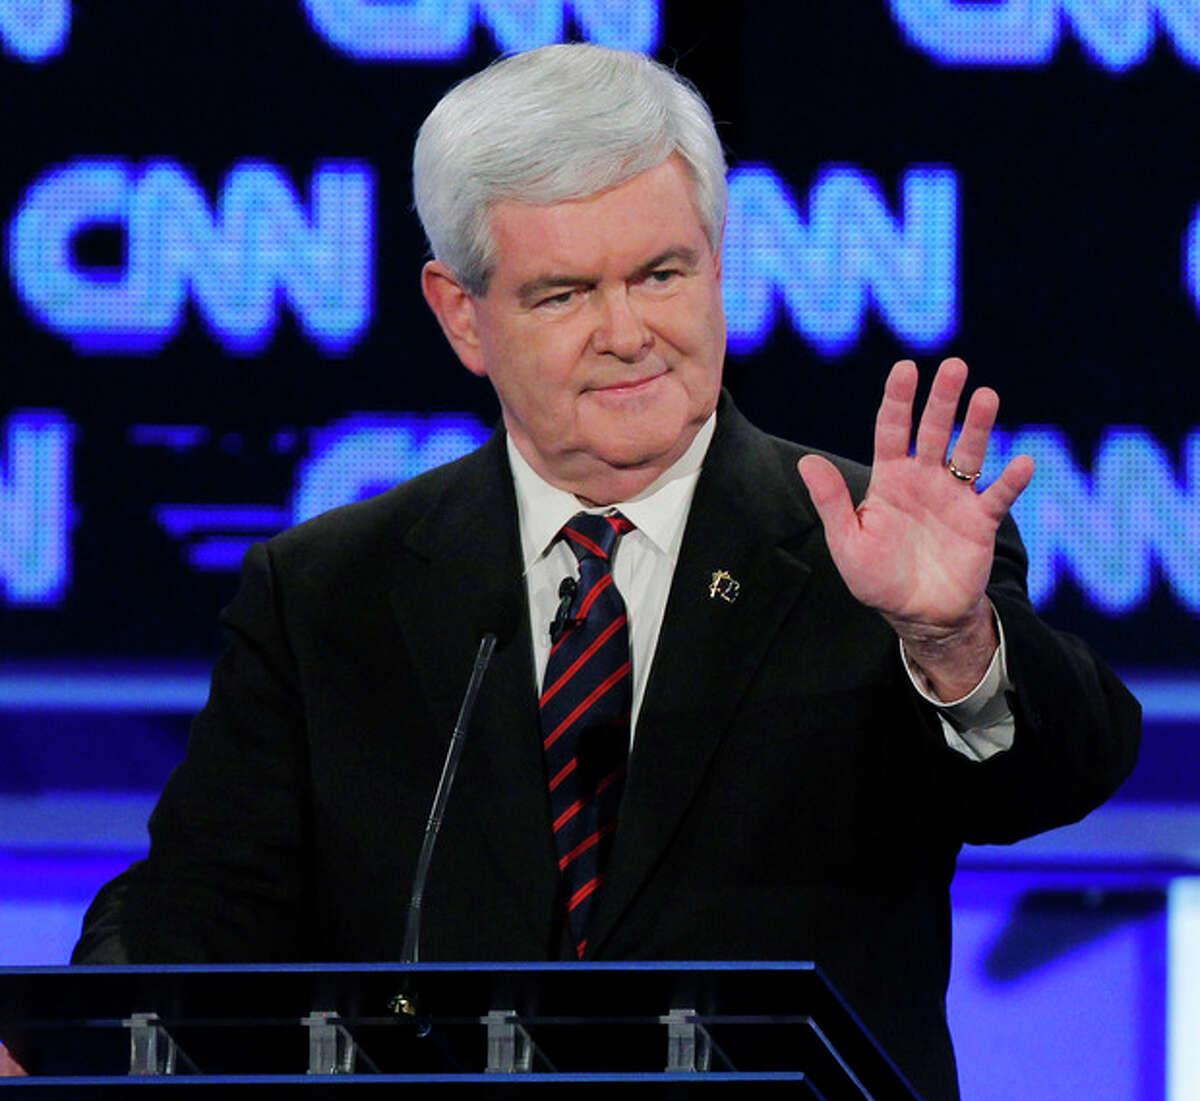 Republican presidential candidate former House Speaker Newt Gingrich participates in the Republican presidential candidates debate in Jacksonville, Fla., Thursday, Jan. 26, 2012. (AP Photo/Matt Rourke)